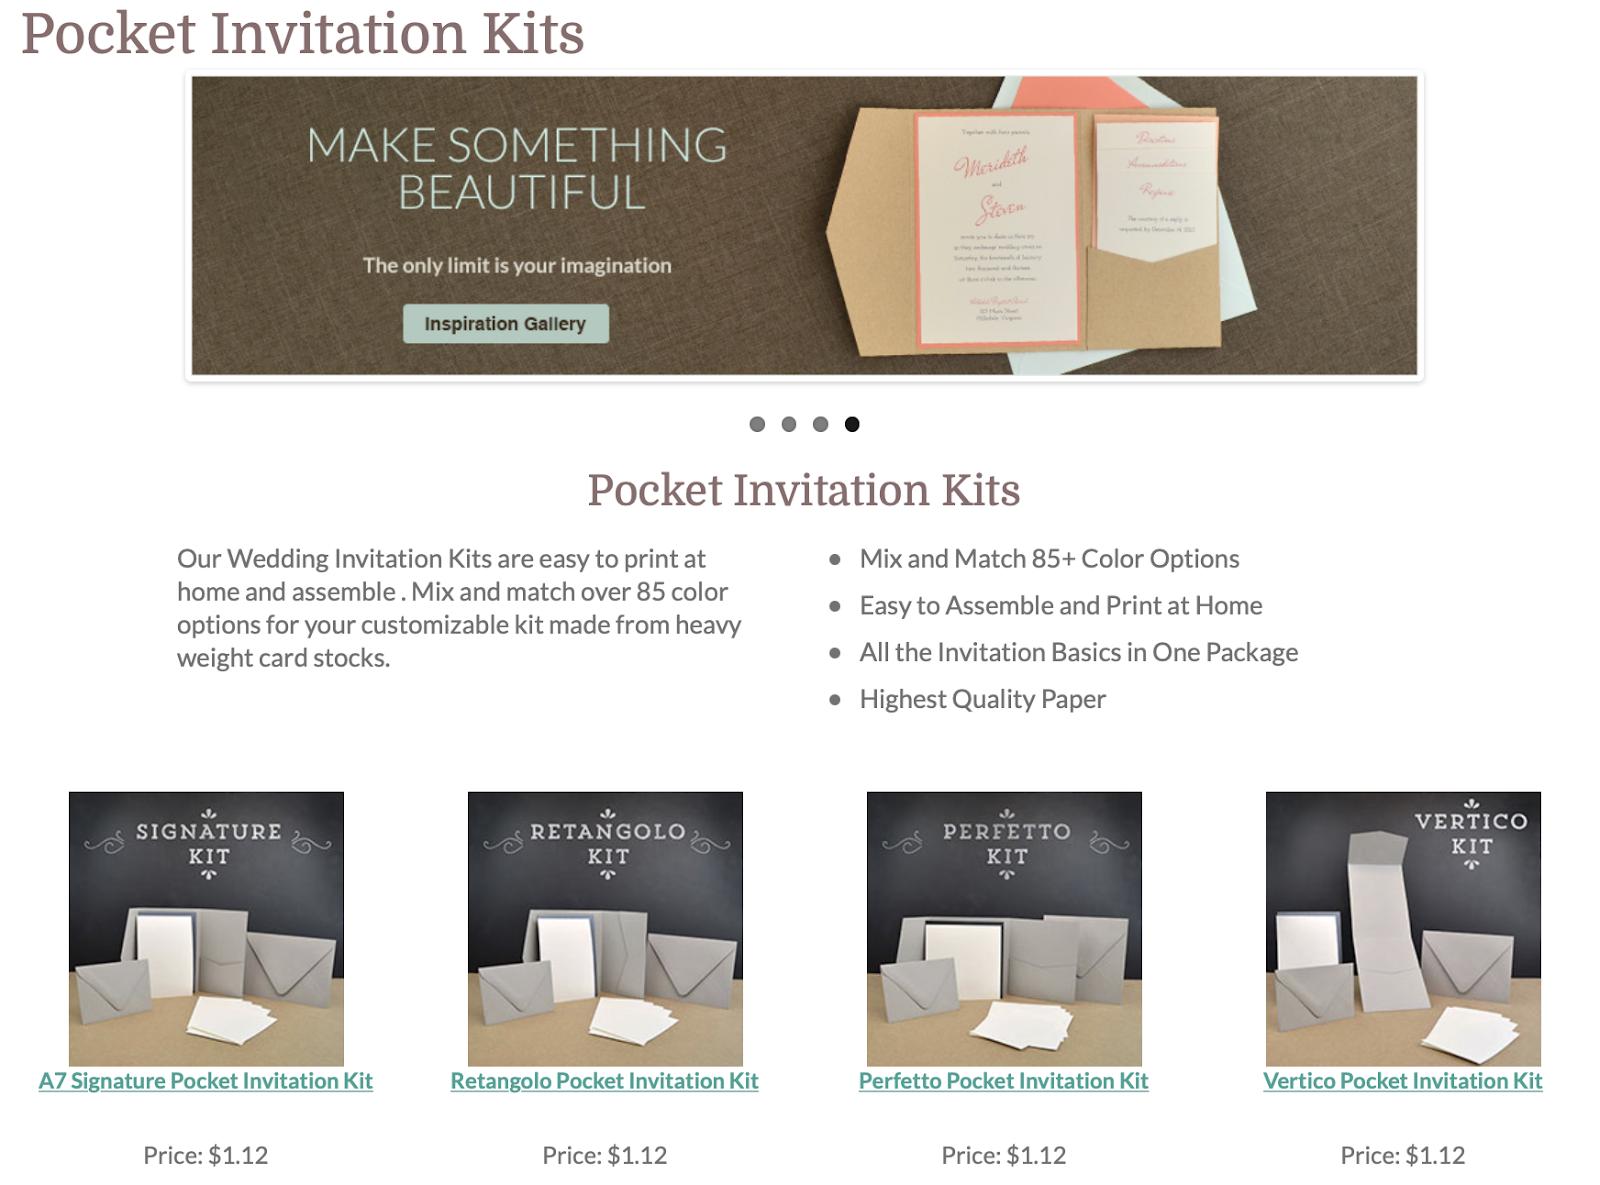 DIY wedding invitation kit by Cards & Pockets